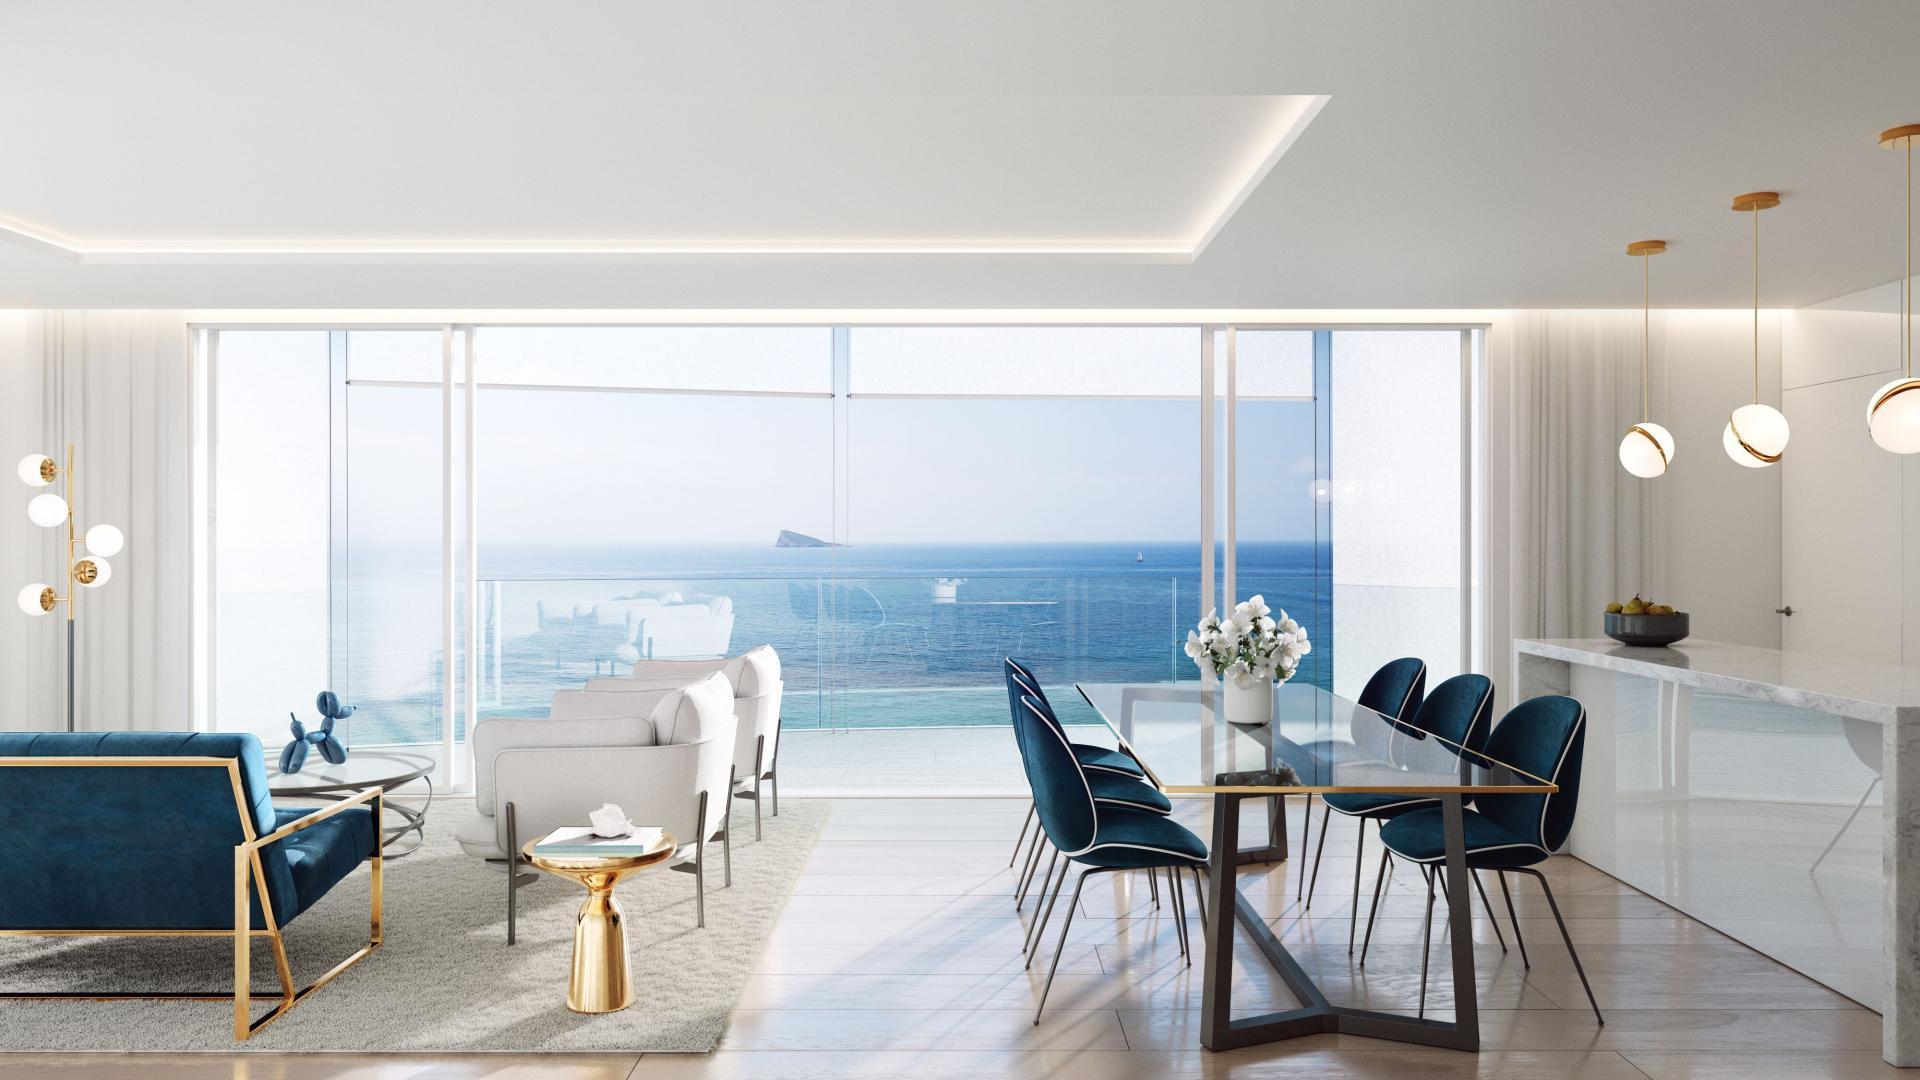 Appartement de luxe à vendre en Espagne, terrasse spacieuse 1 ° ligne plage in Medvilla Spanje